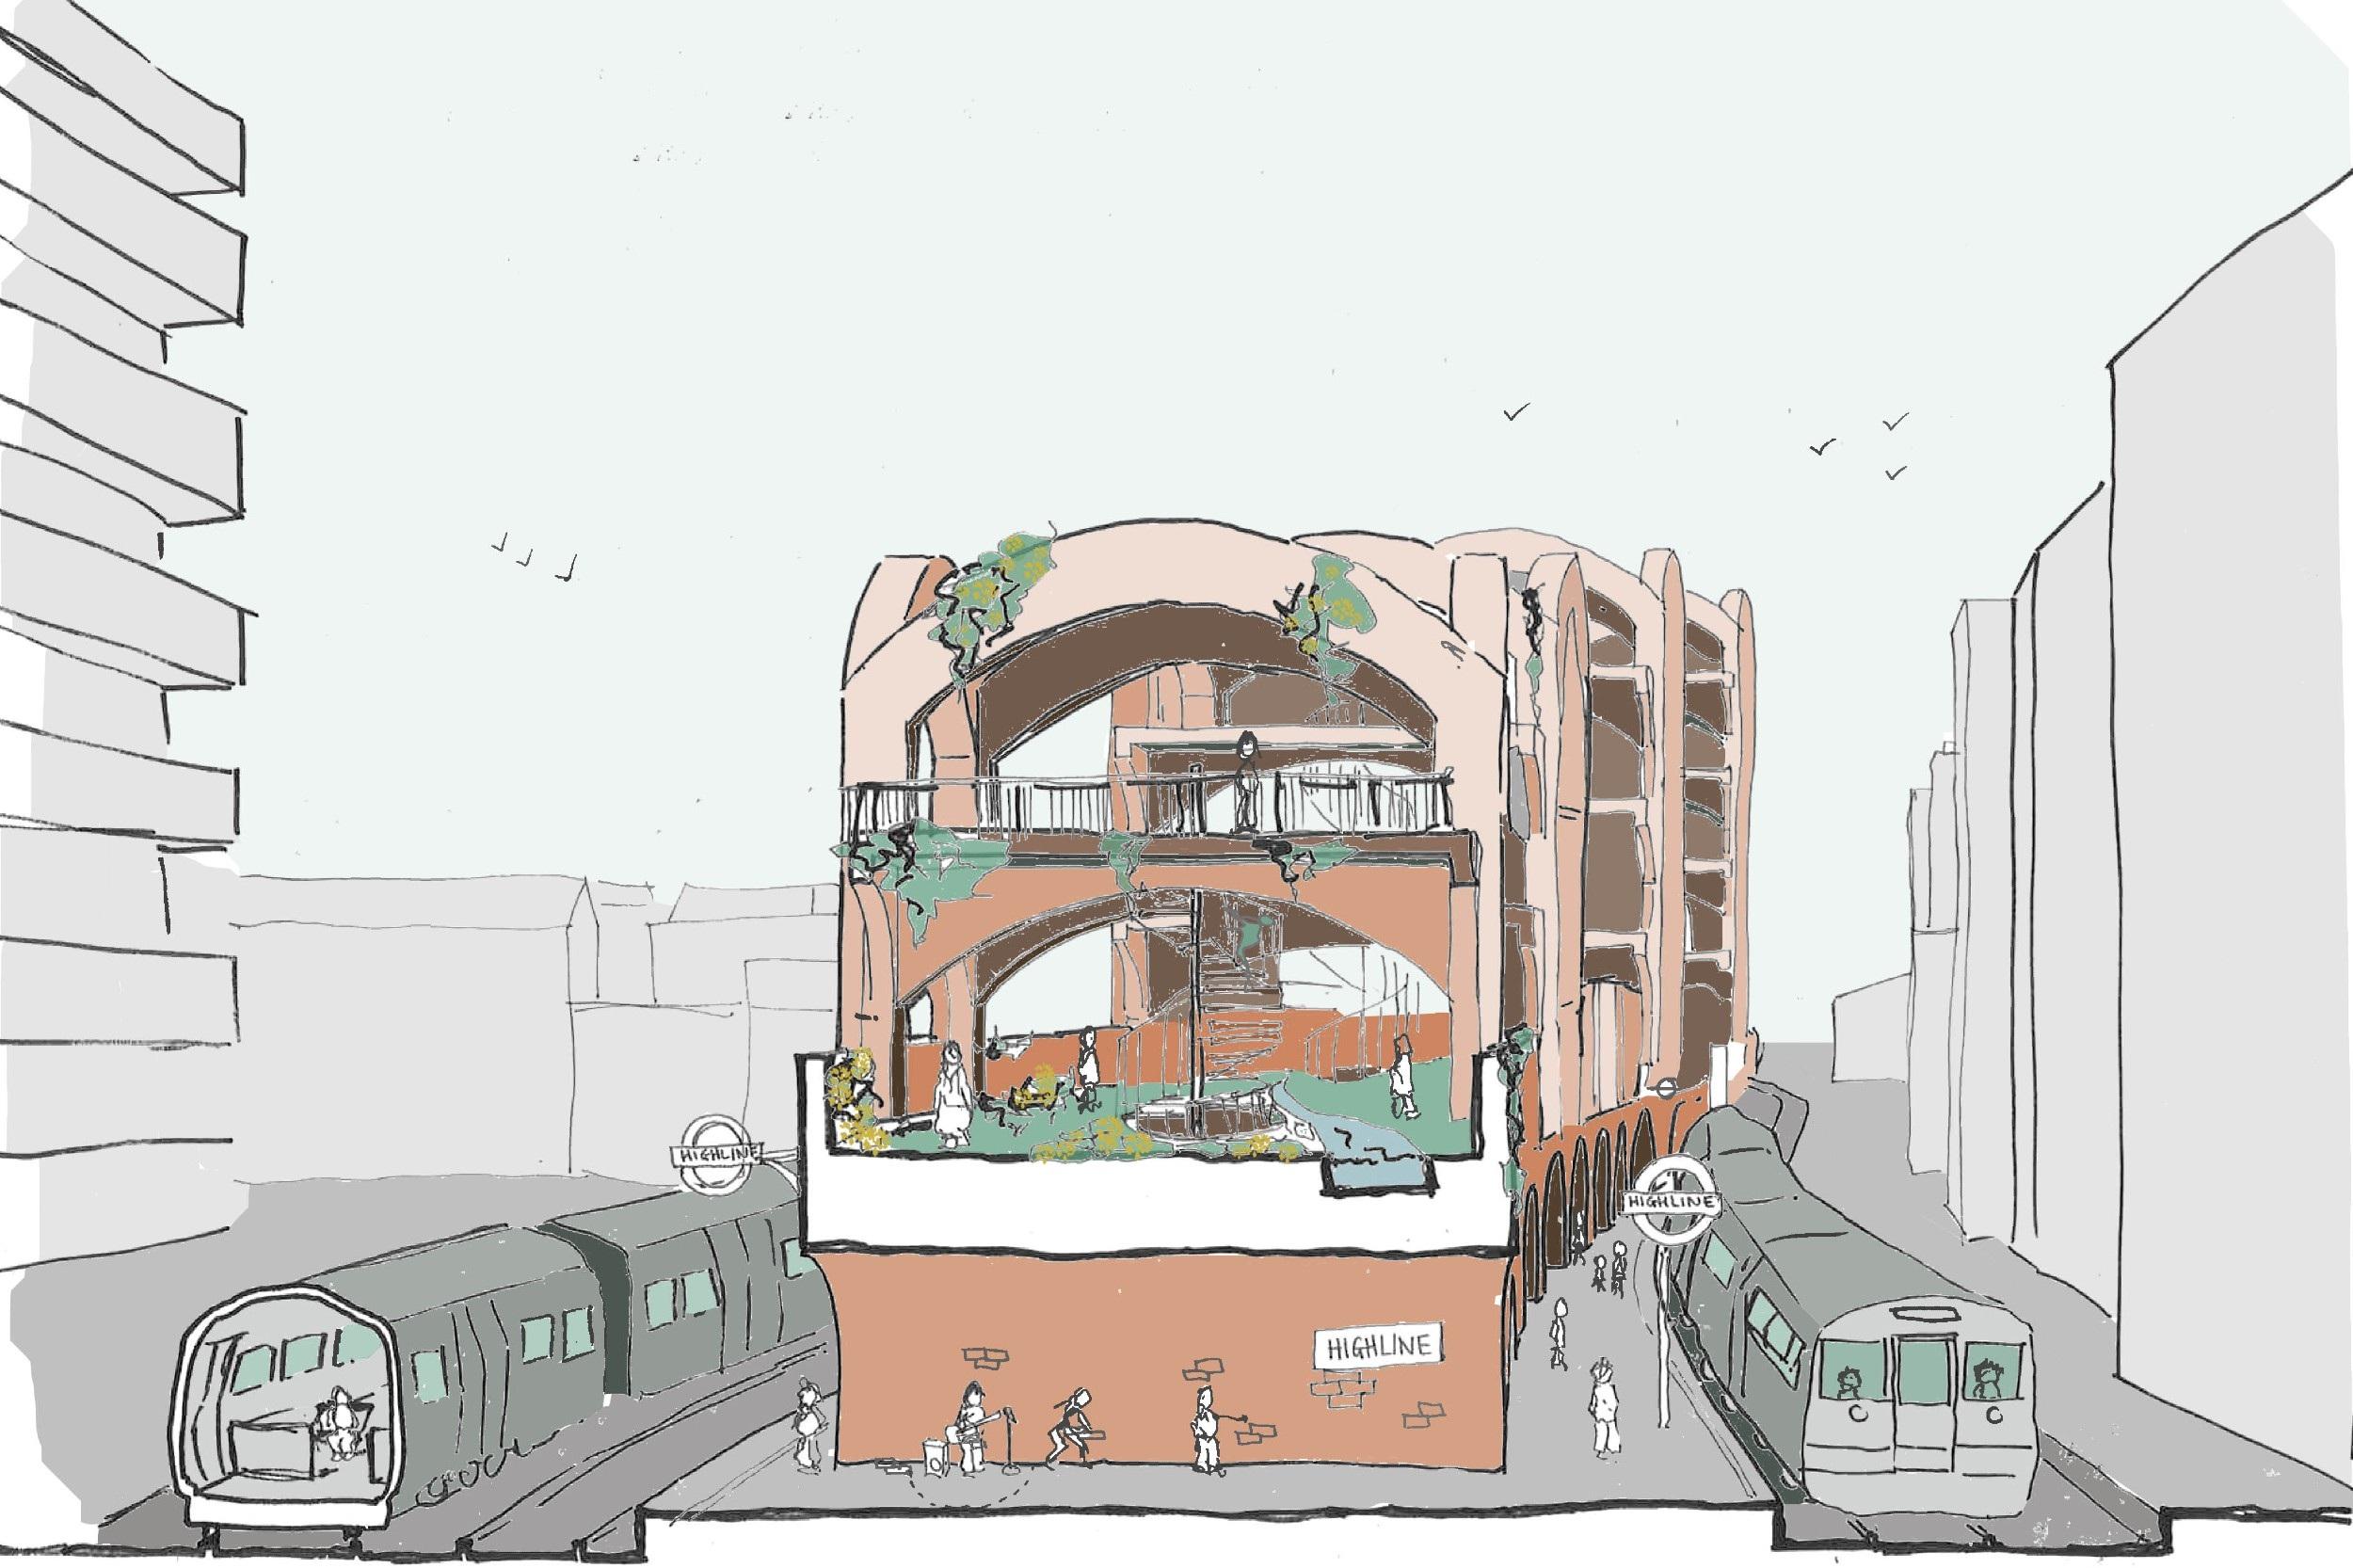 Hammersmith High Line section train station short.jpg